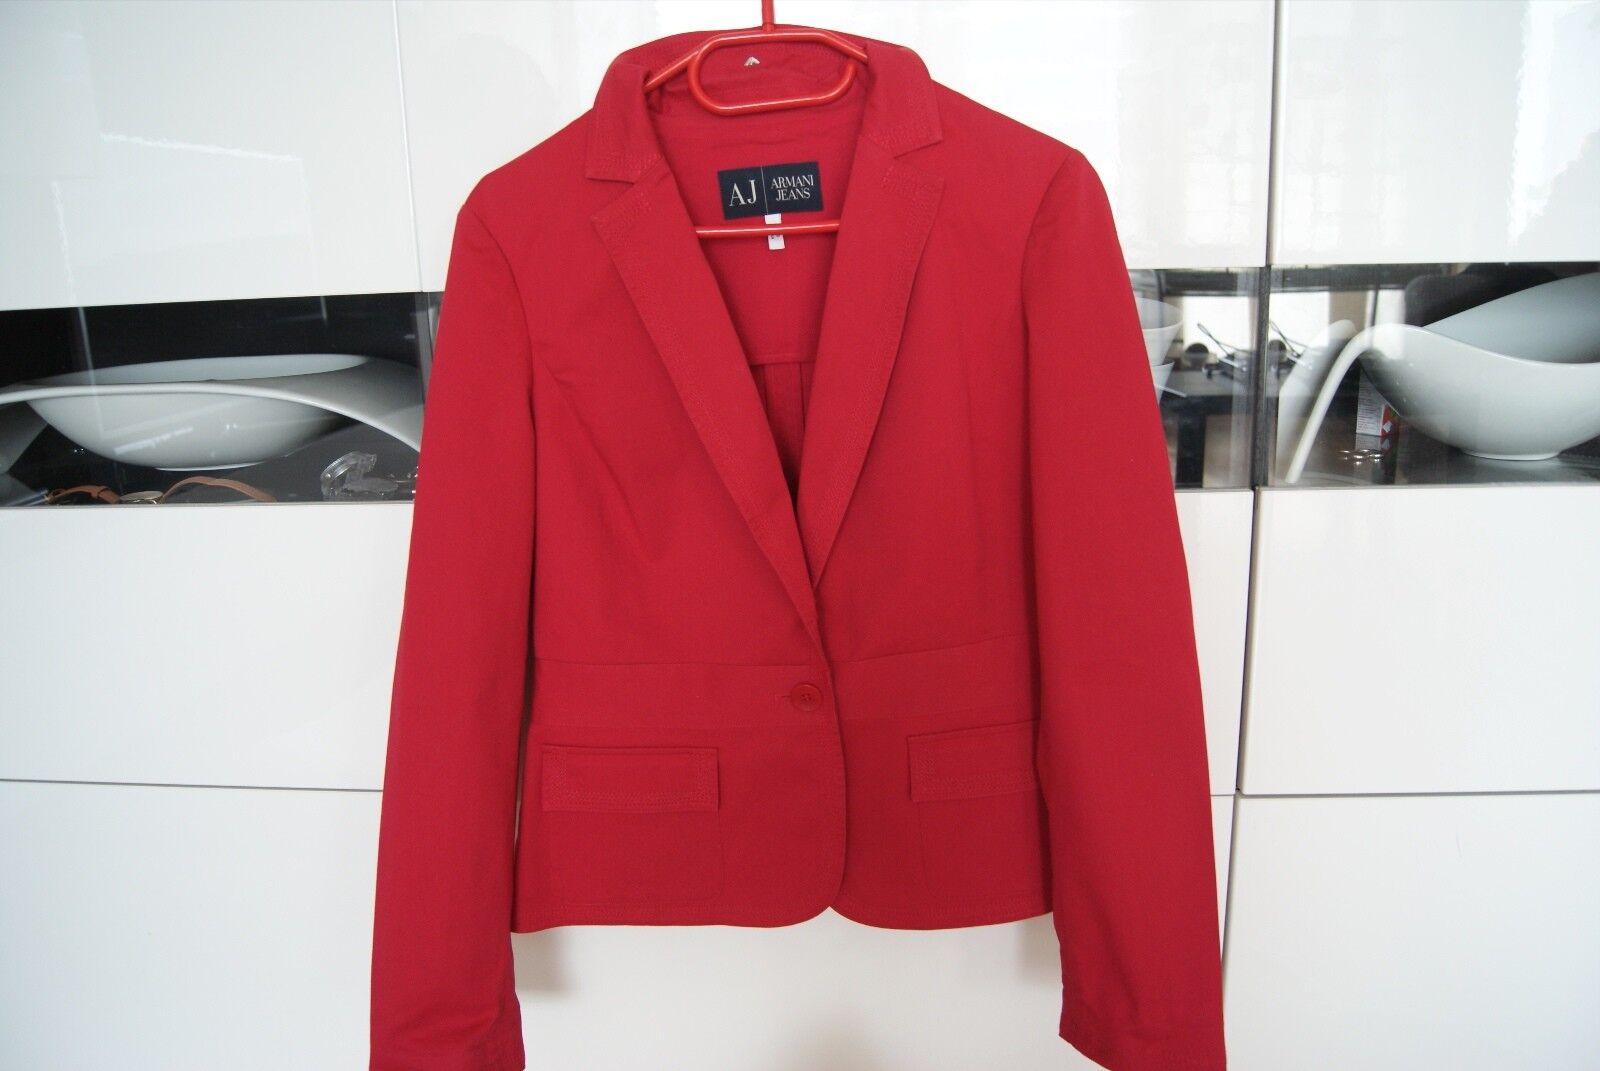 Armani Jeans Blazer Gr.38 Super | Langfristiger Ruf  | Outlet  Outlet  Outlet  | Online-Exportgeschäft  | Nicht so teuer  | Kostengünstiger  1991ed